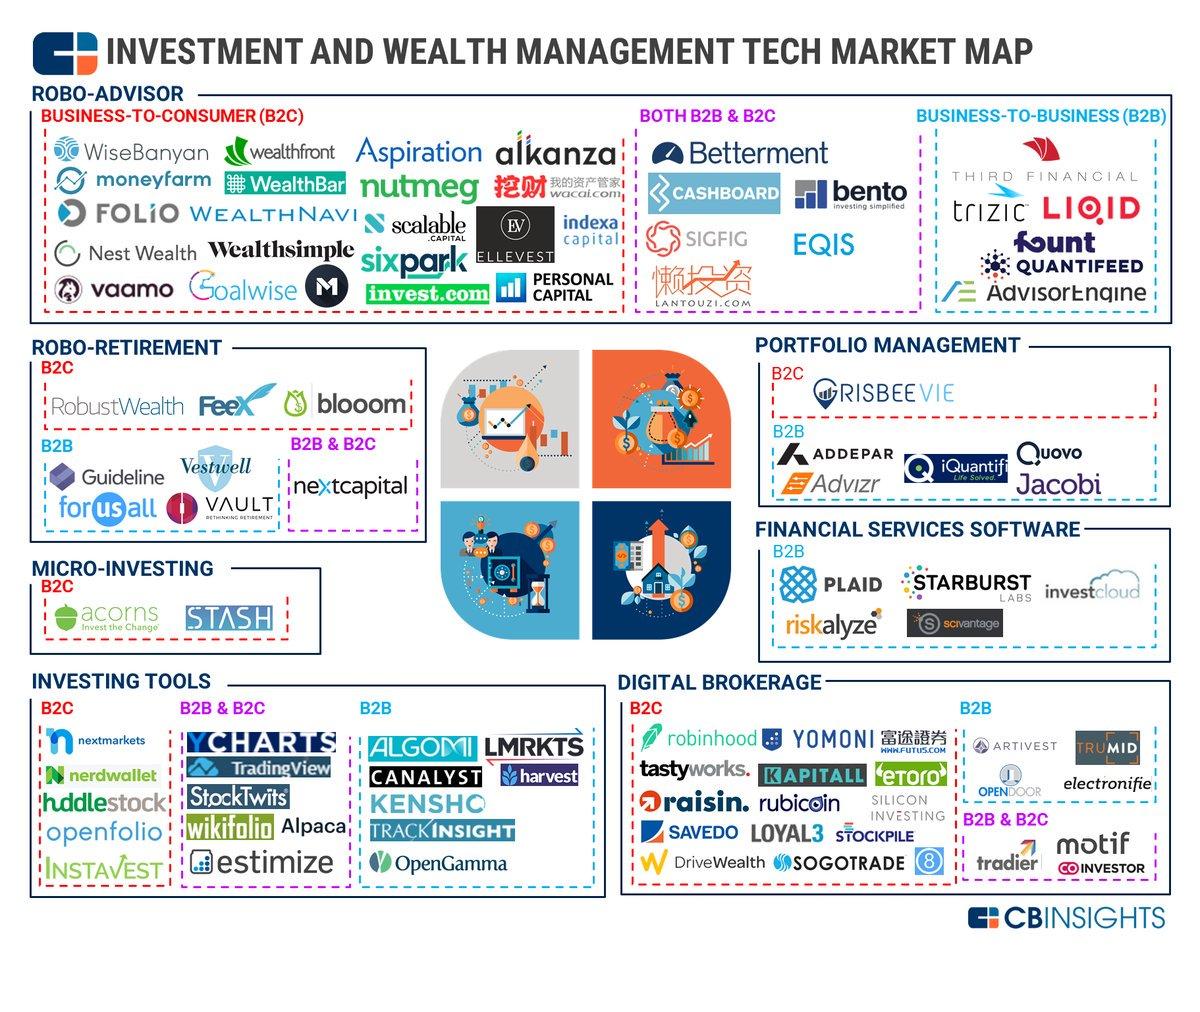 Companies Transforming B2B &amp; B2C Investment And #WealthManagement  http:// cbi.vc/2yuCqF6  &nbsp;    v @CBinsights #fintech #banking #Roboadvisor #bot <br>http://pic.twitter.com/oiAc3oq5uq